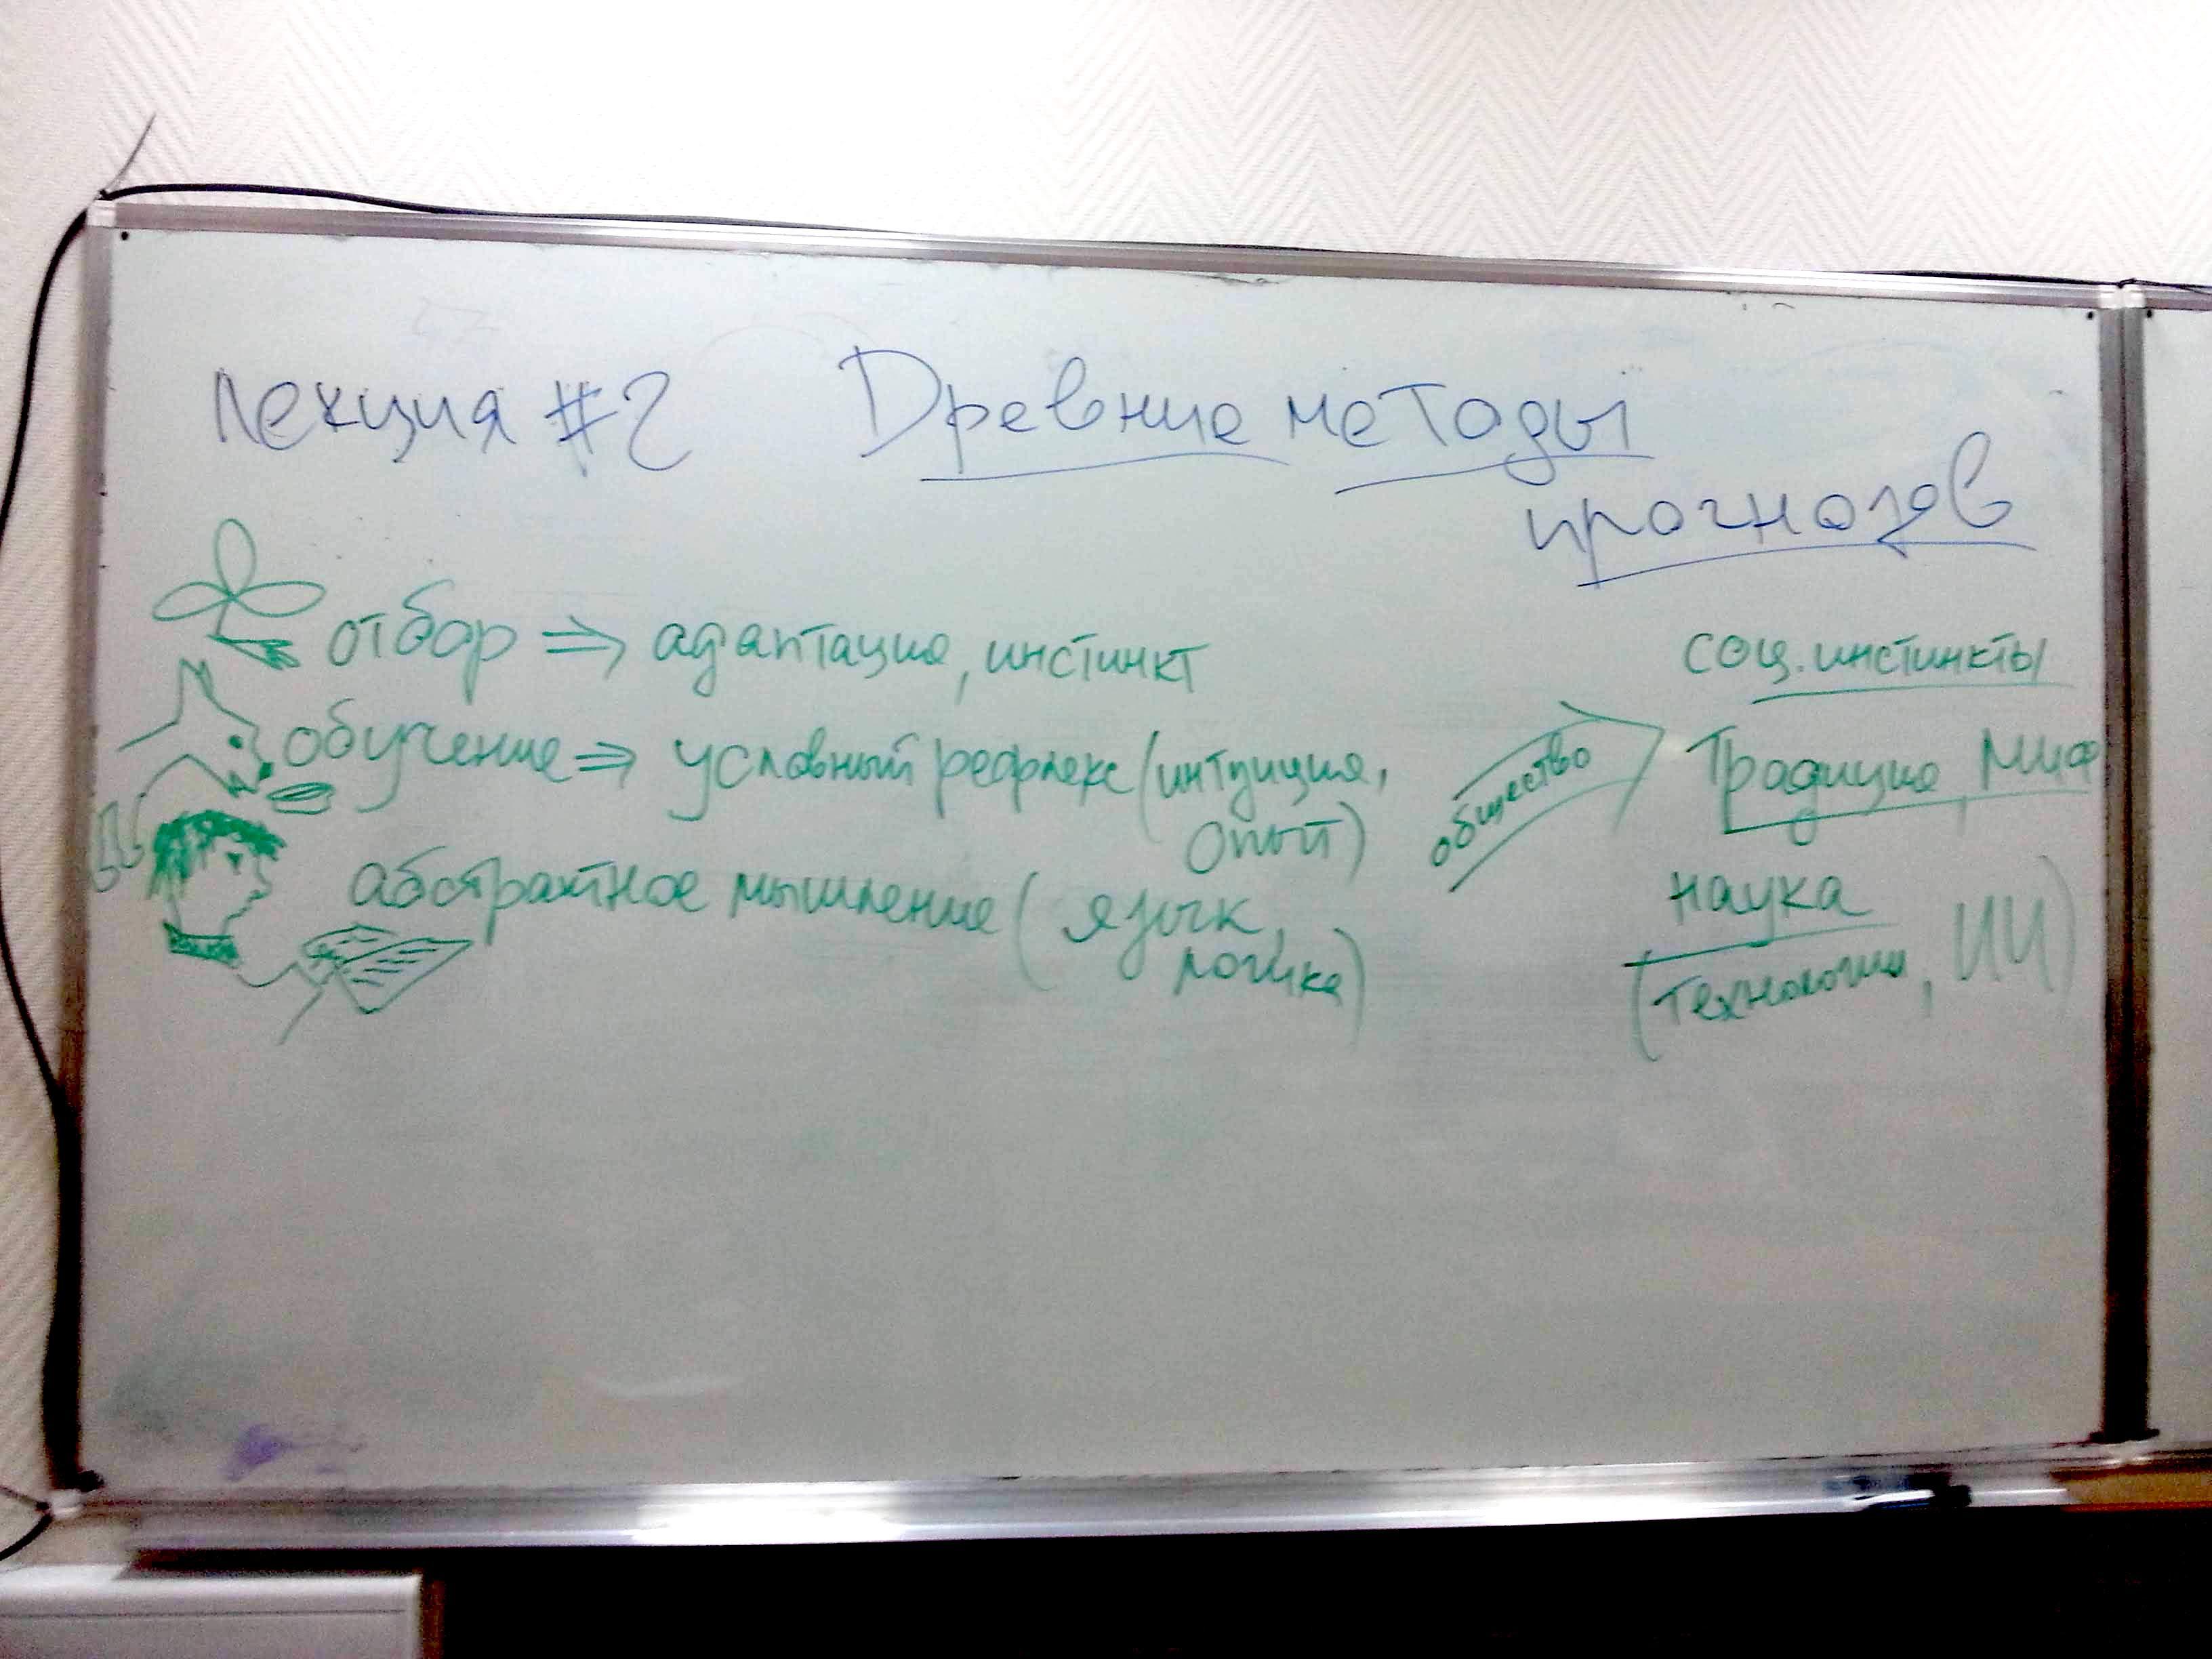 futurology-lecture2